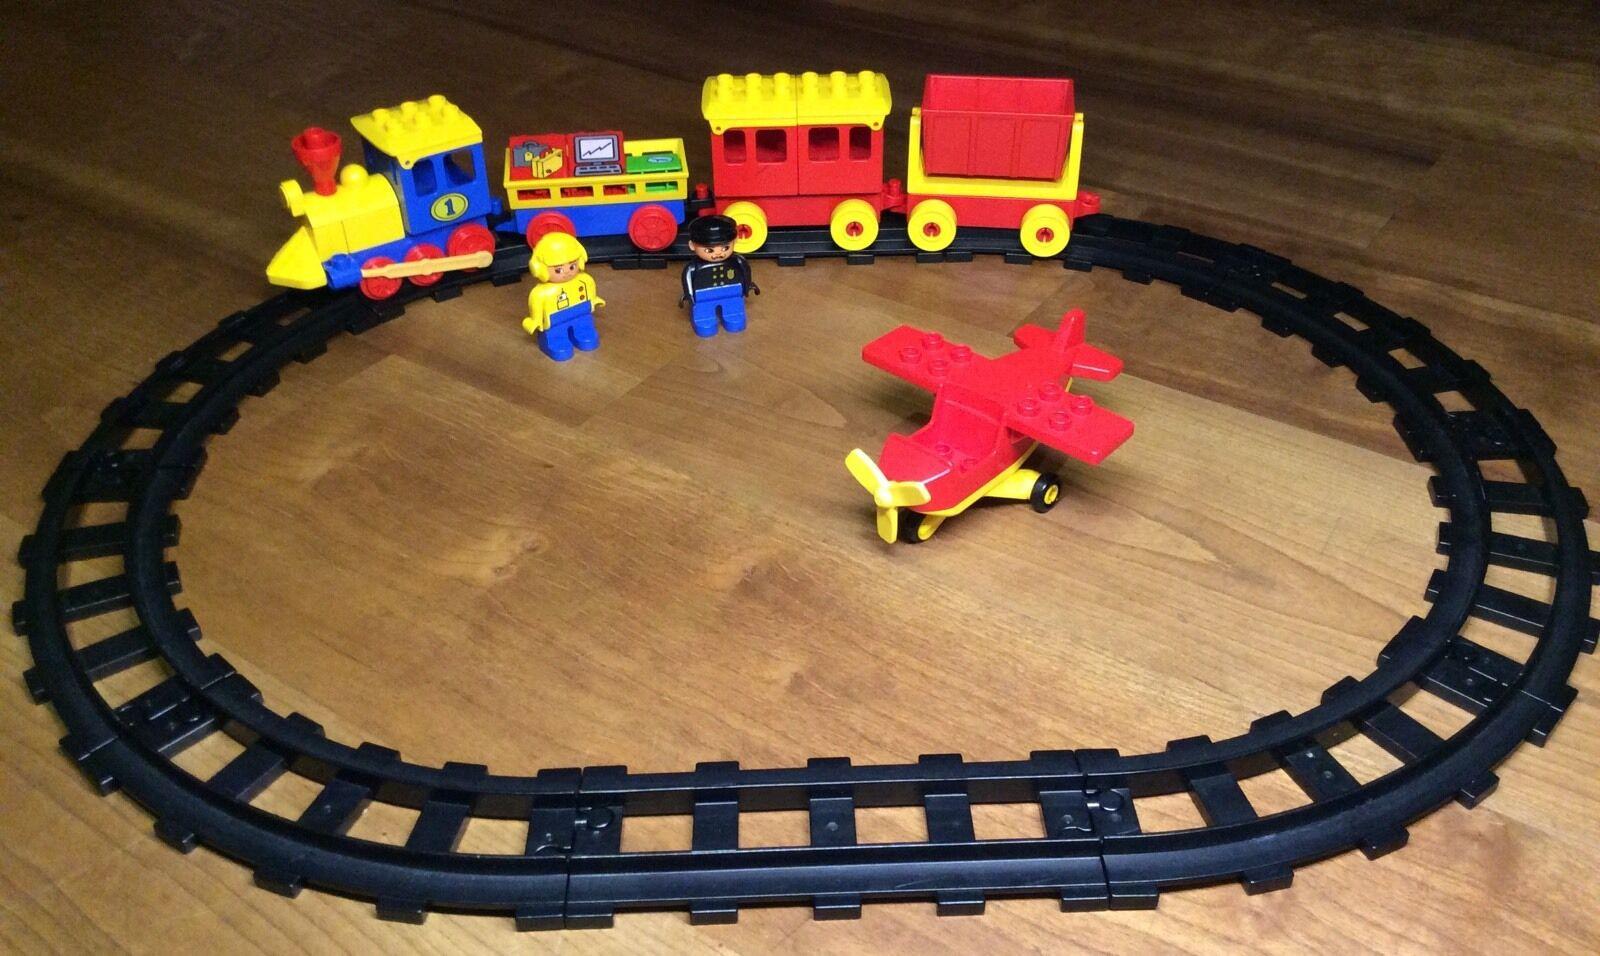 DUPLO LEGO Ferrovia Treno Locomotiva LOK AVIATORI AEREO Rotaie Binari